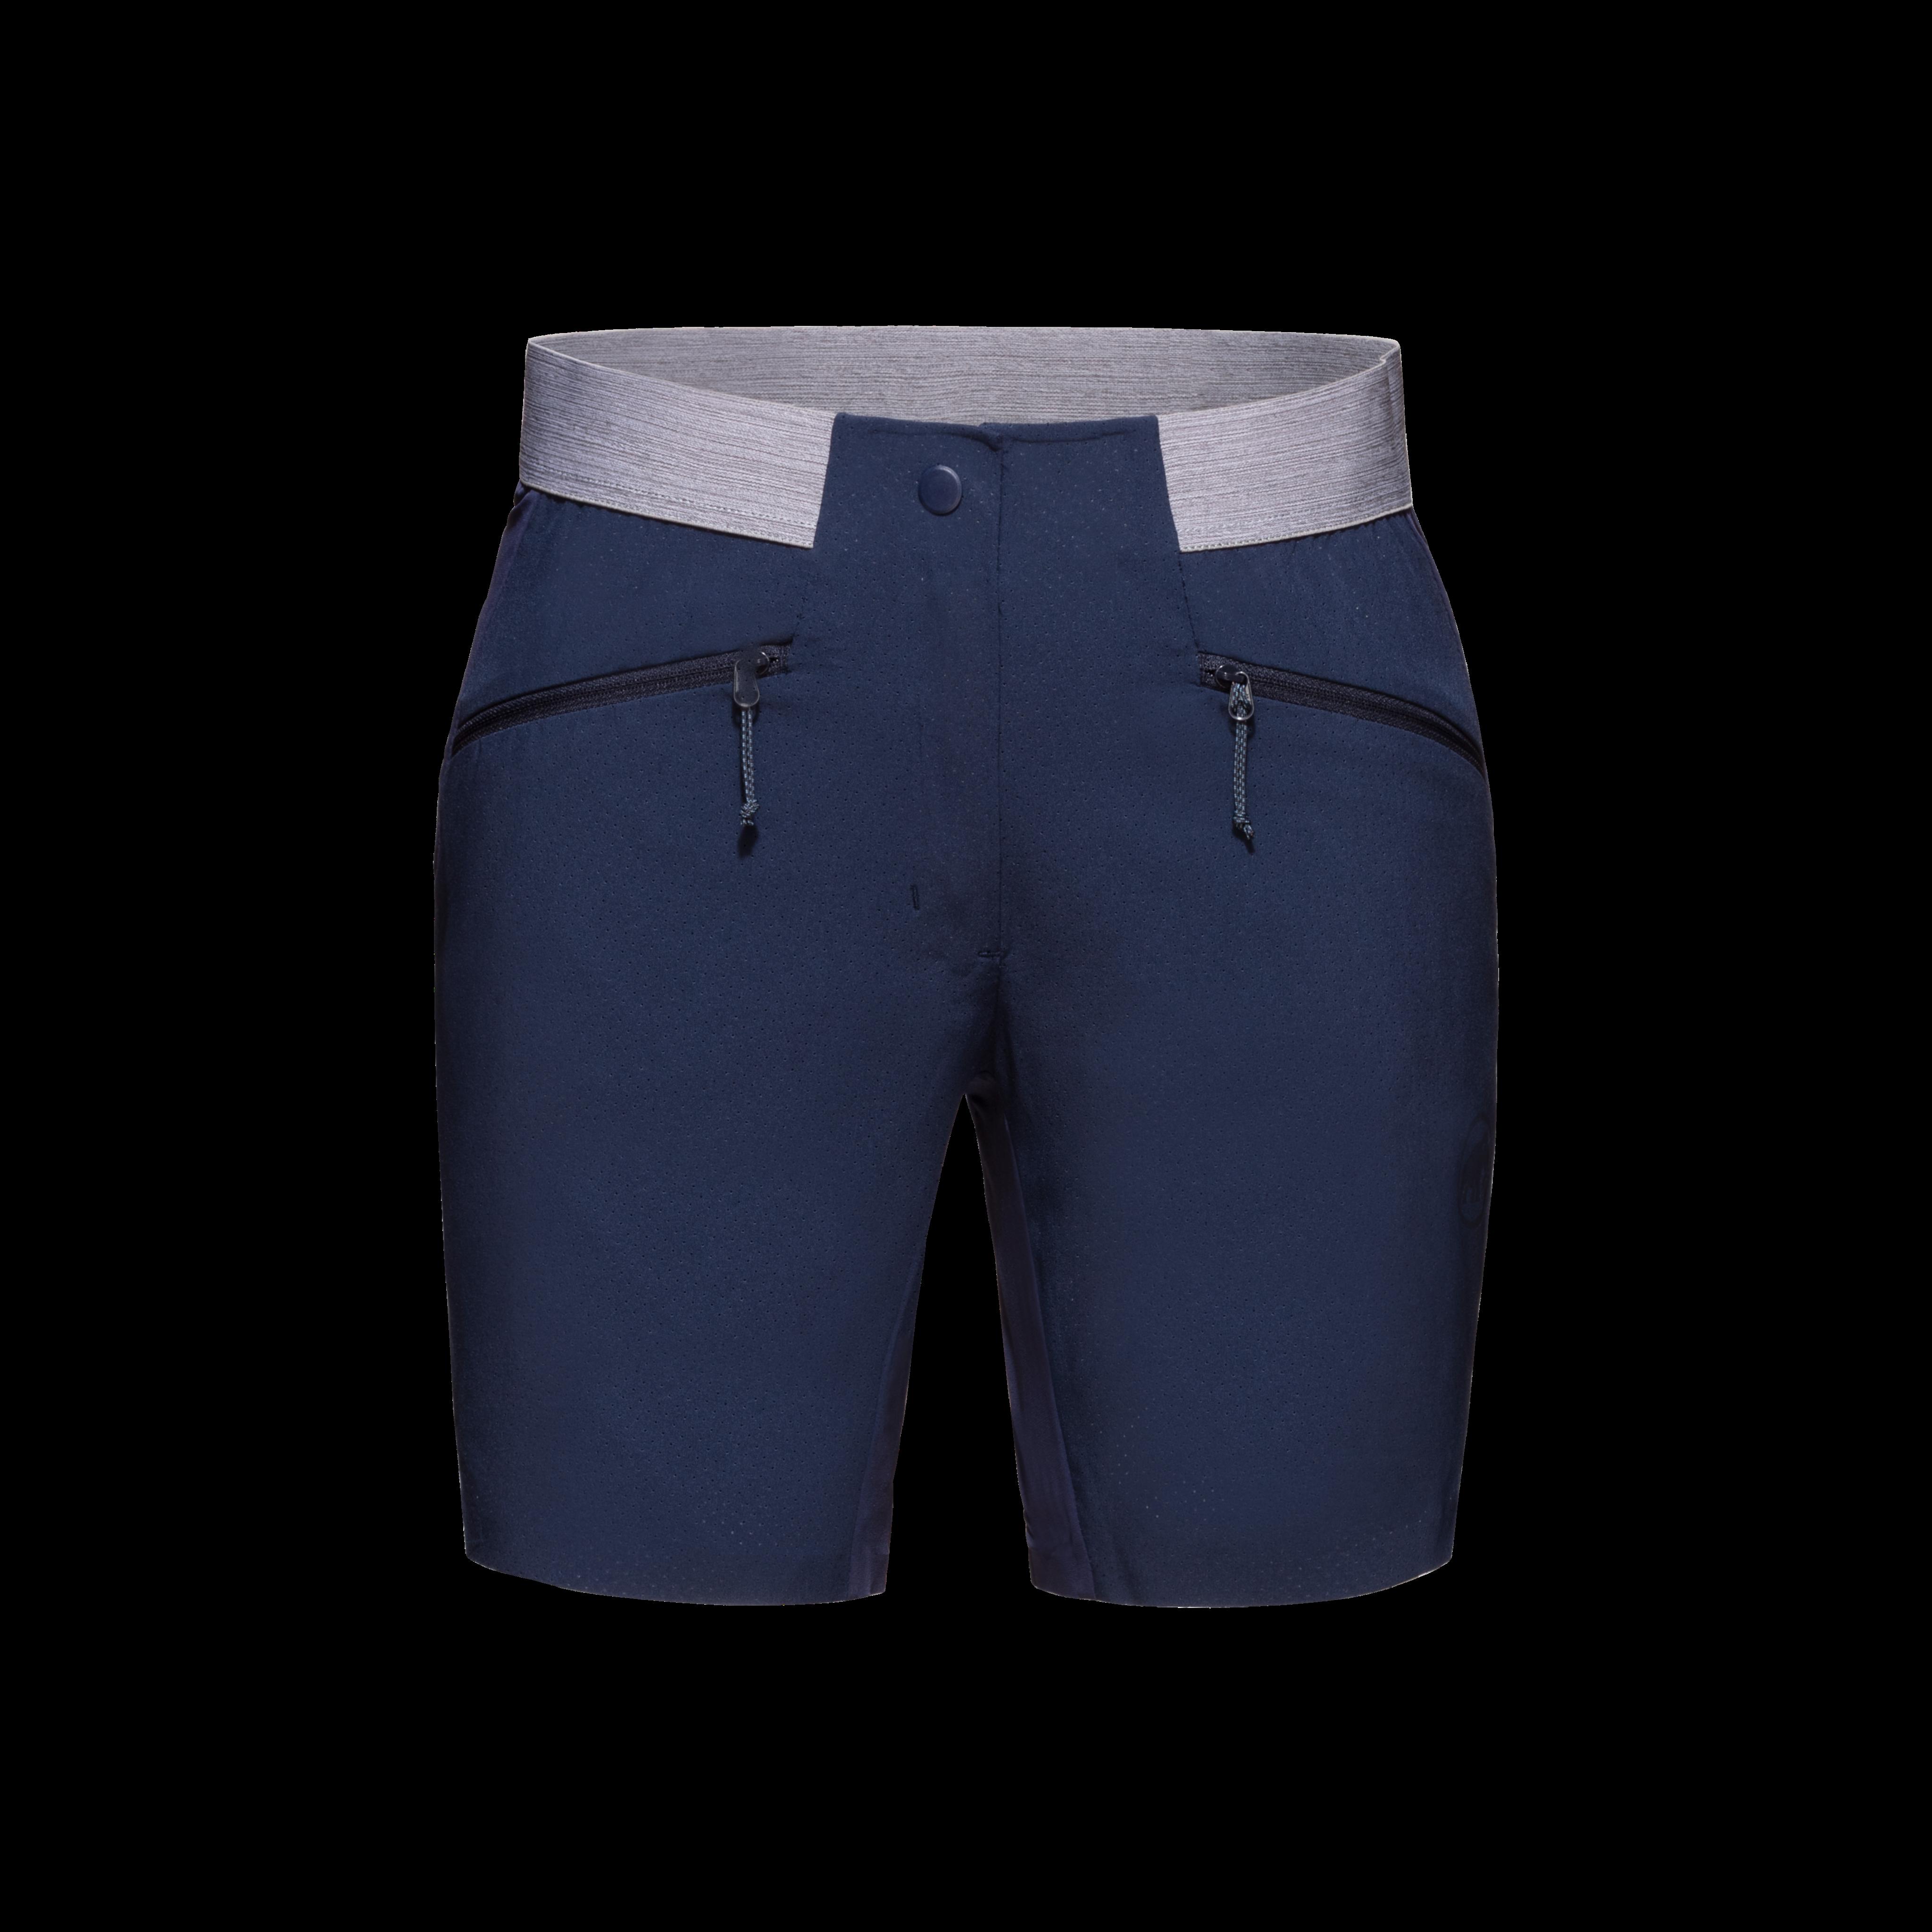 Sertig Shorts Women - peacoat, UK 10 thumbnail